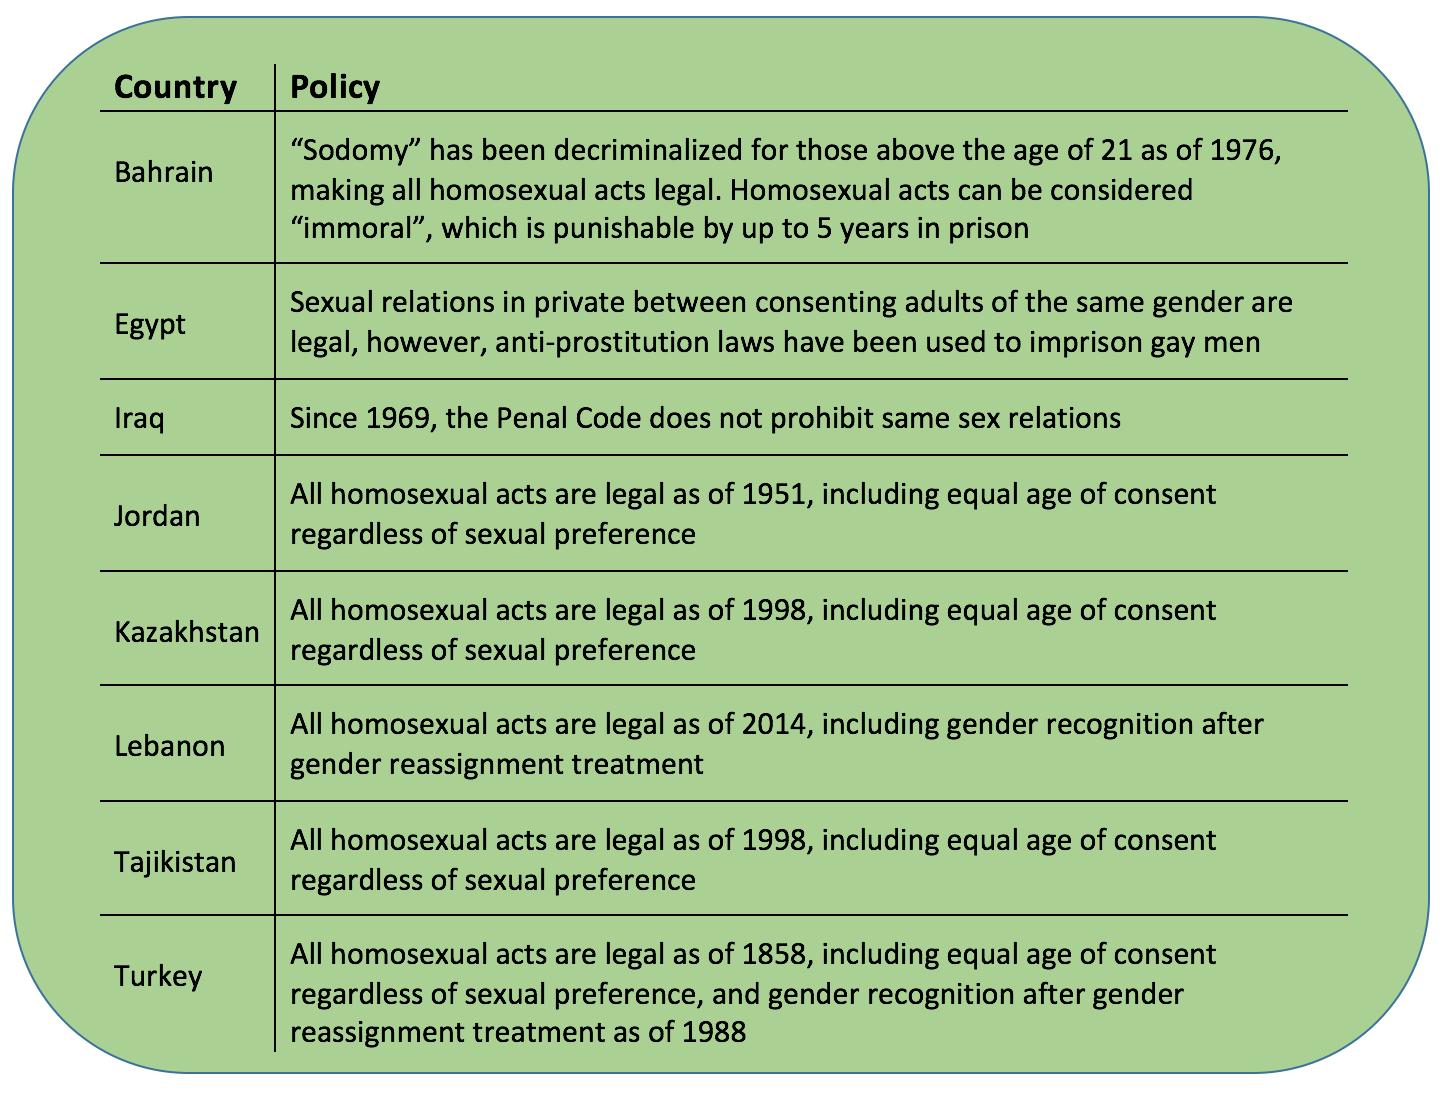 Sources: ILGA report on State Sponsored Homophobia and  equaldex.com